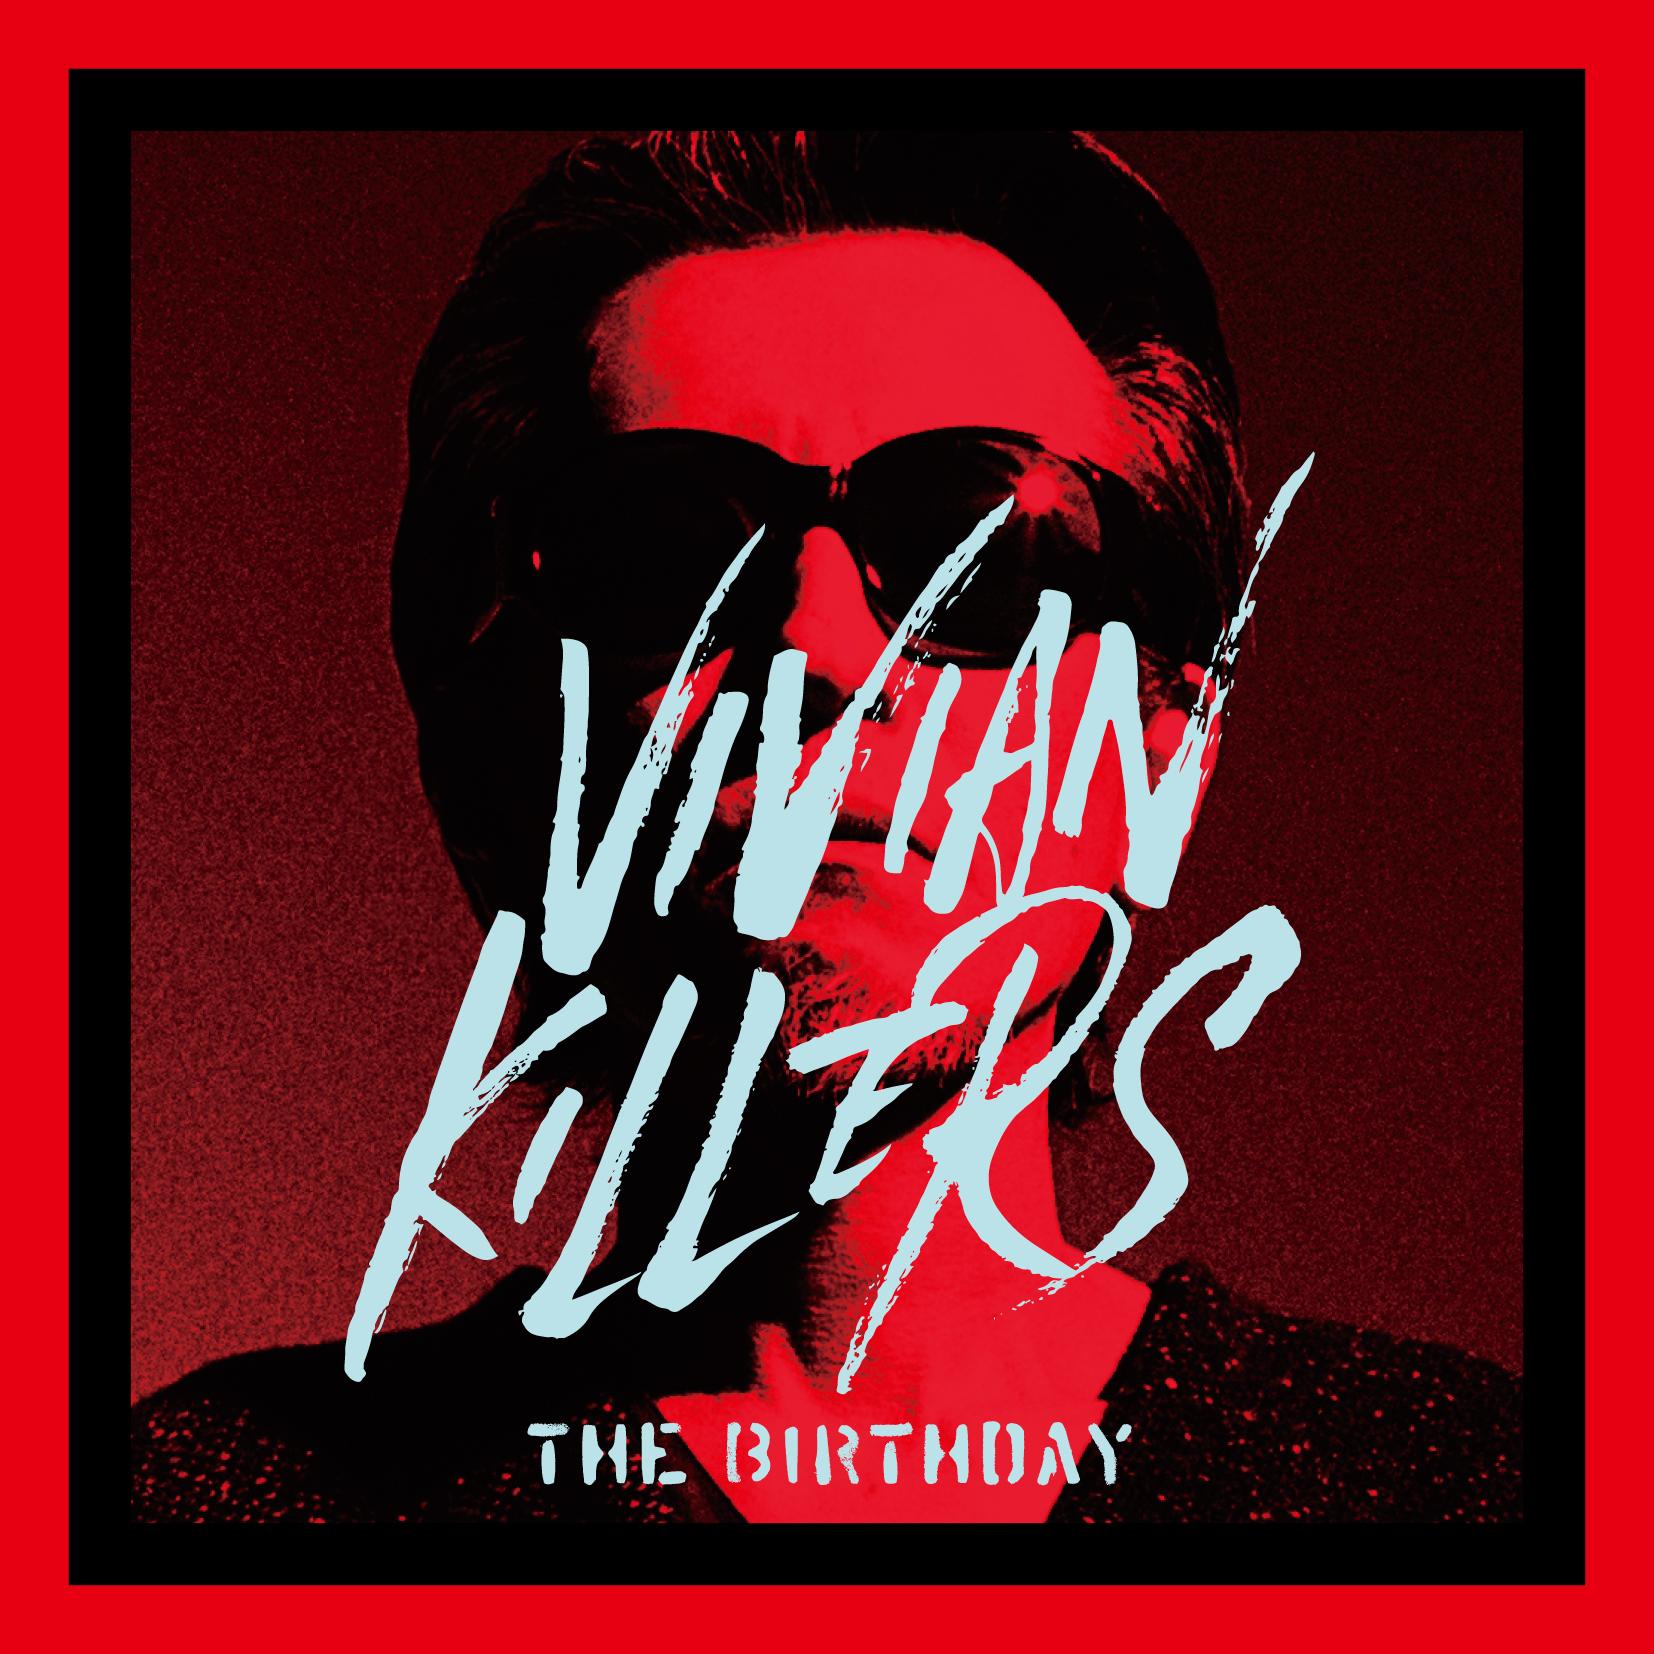 006_VIVIAN KILLERS